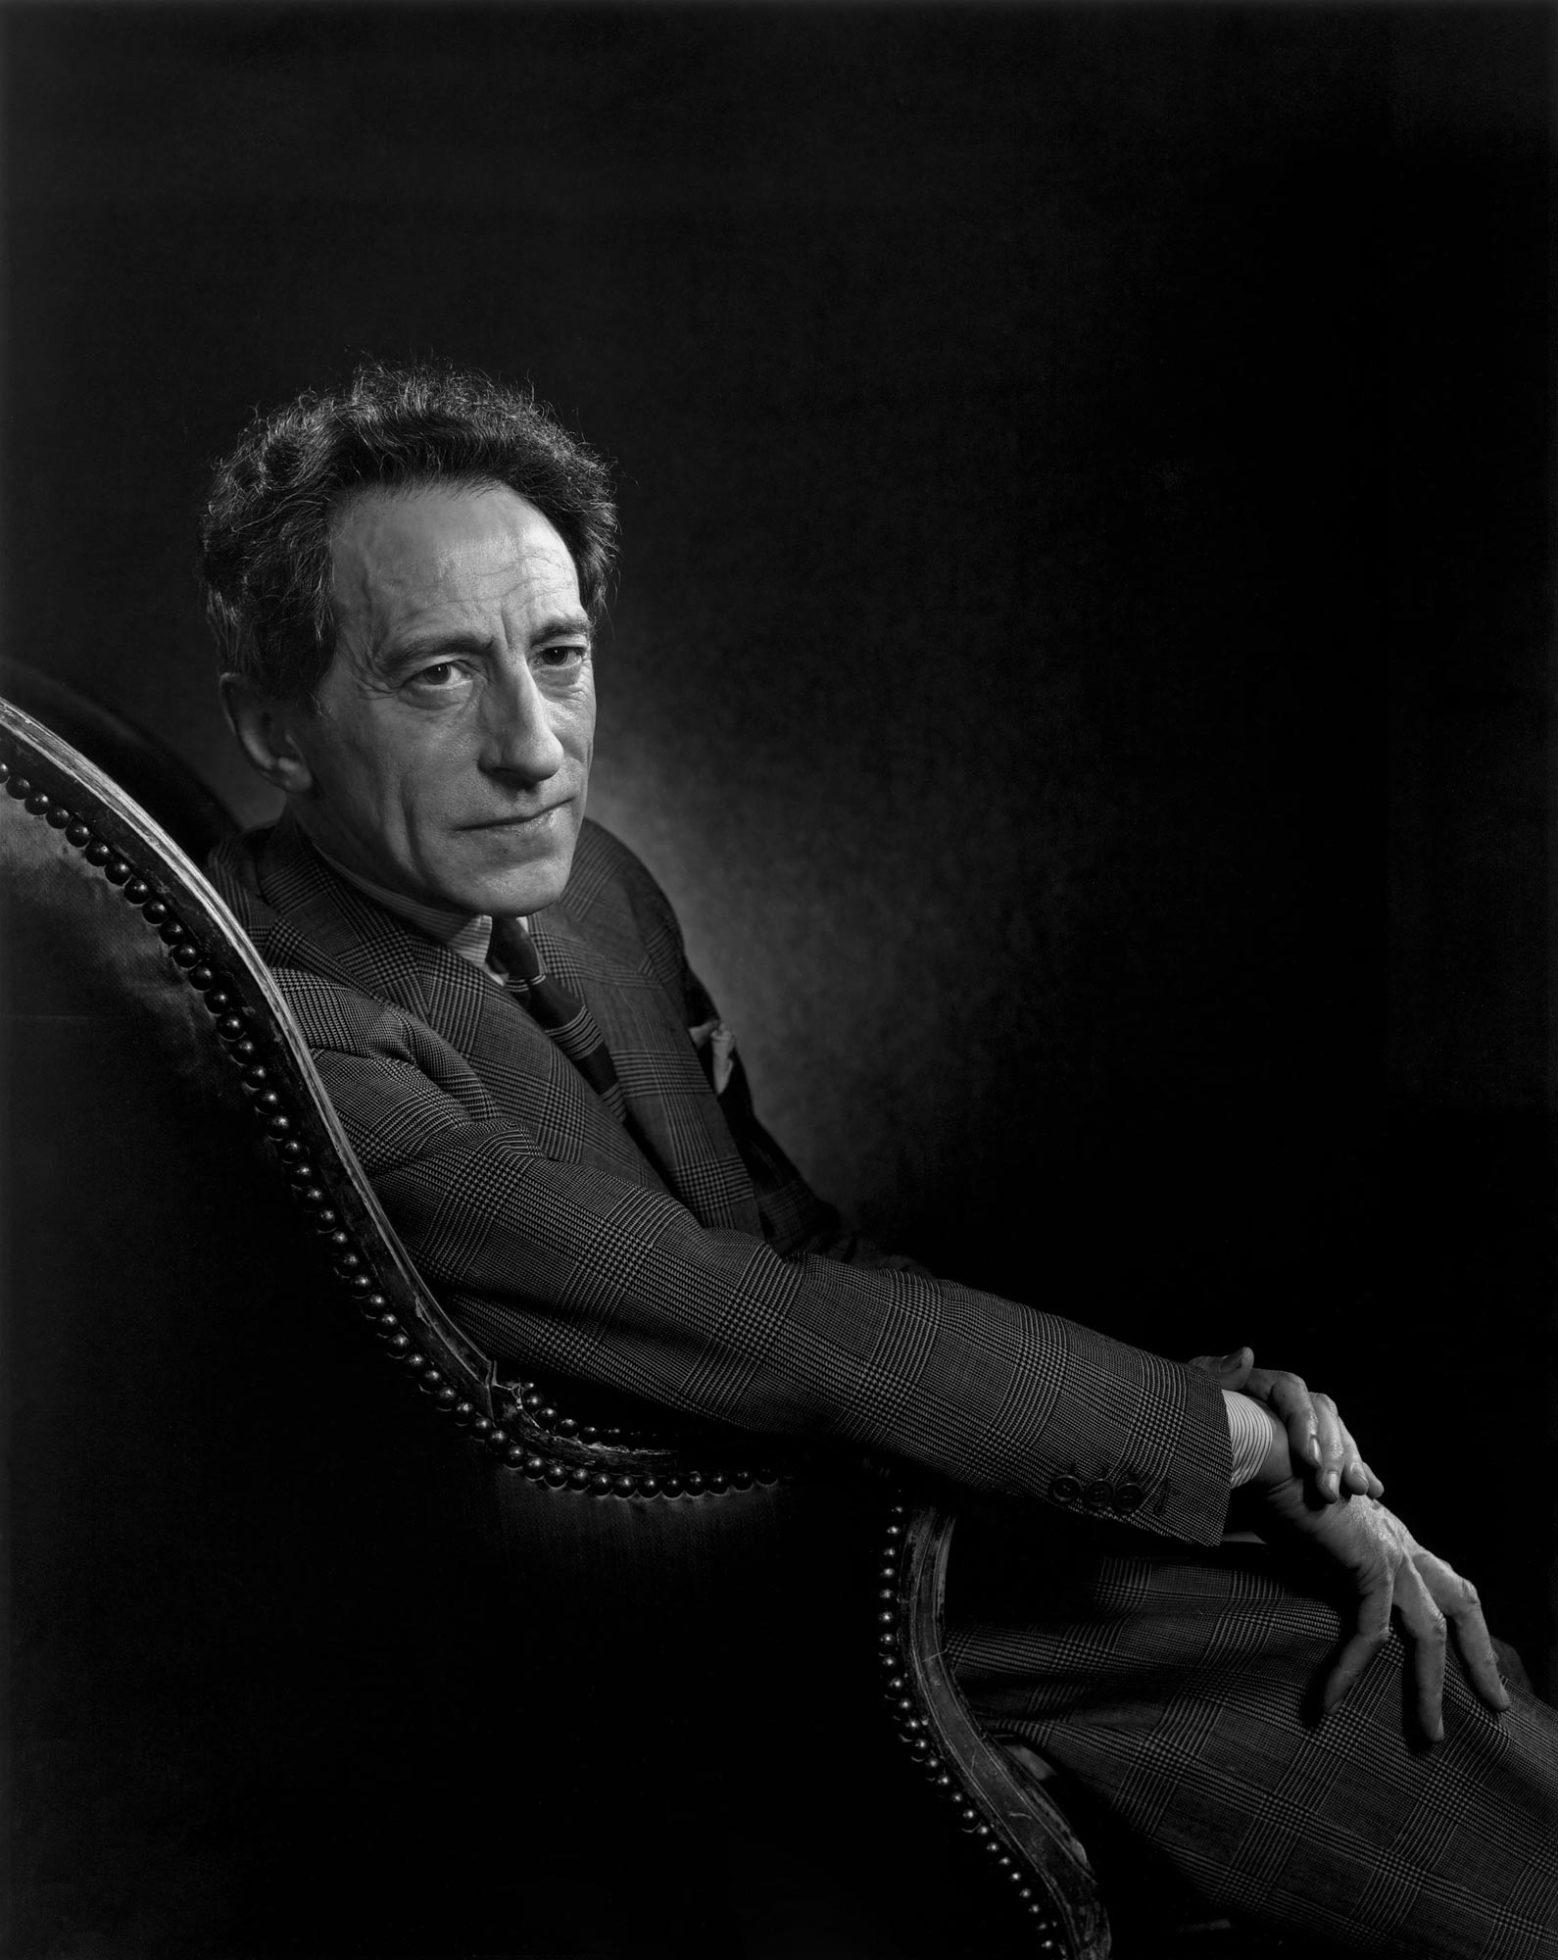 Fotó: Yousuf Karsh: Jean Cocteau, 1949 © Yousuf Karsh